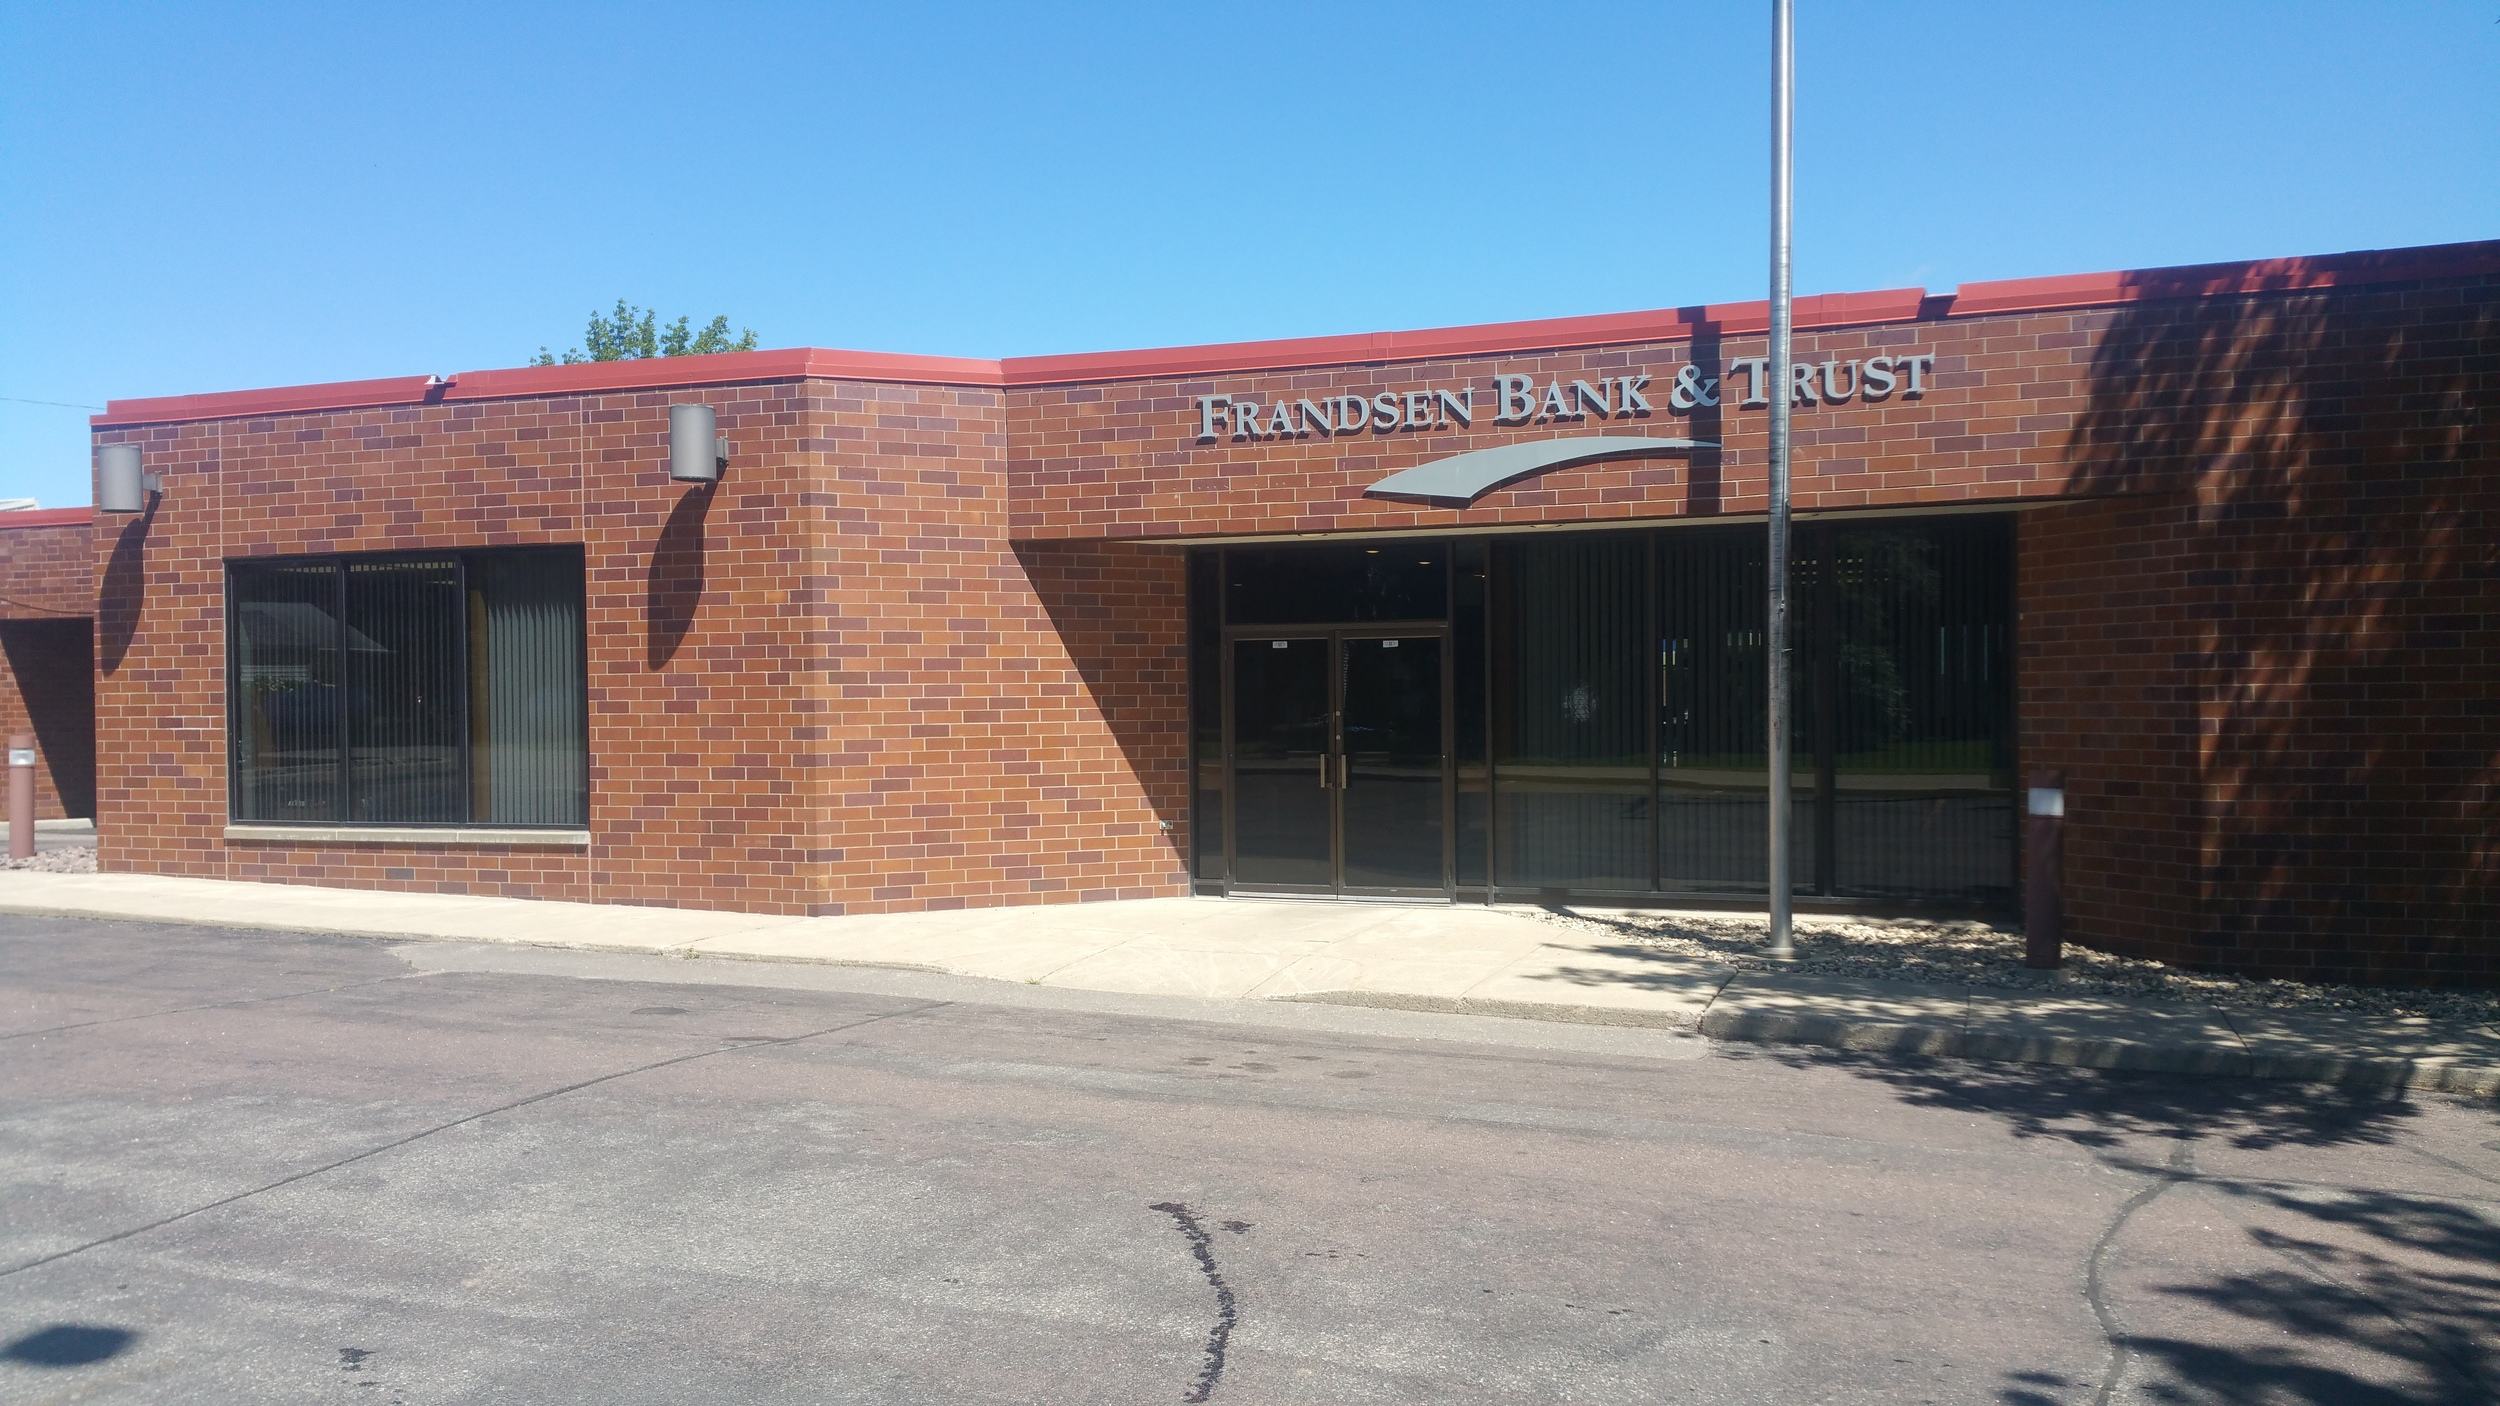 Office Located Inside Frandsen Bank & Trust